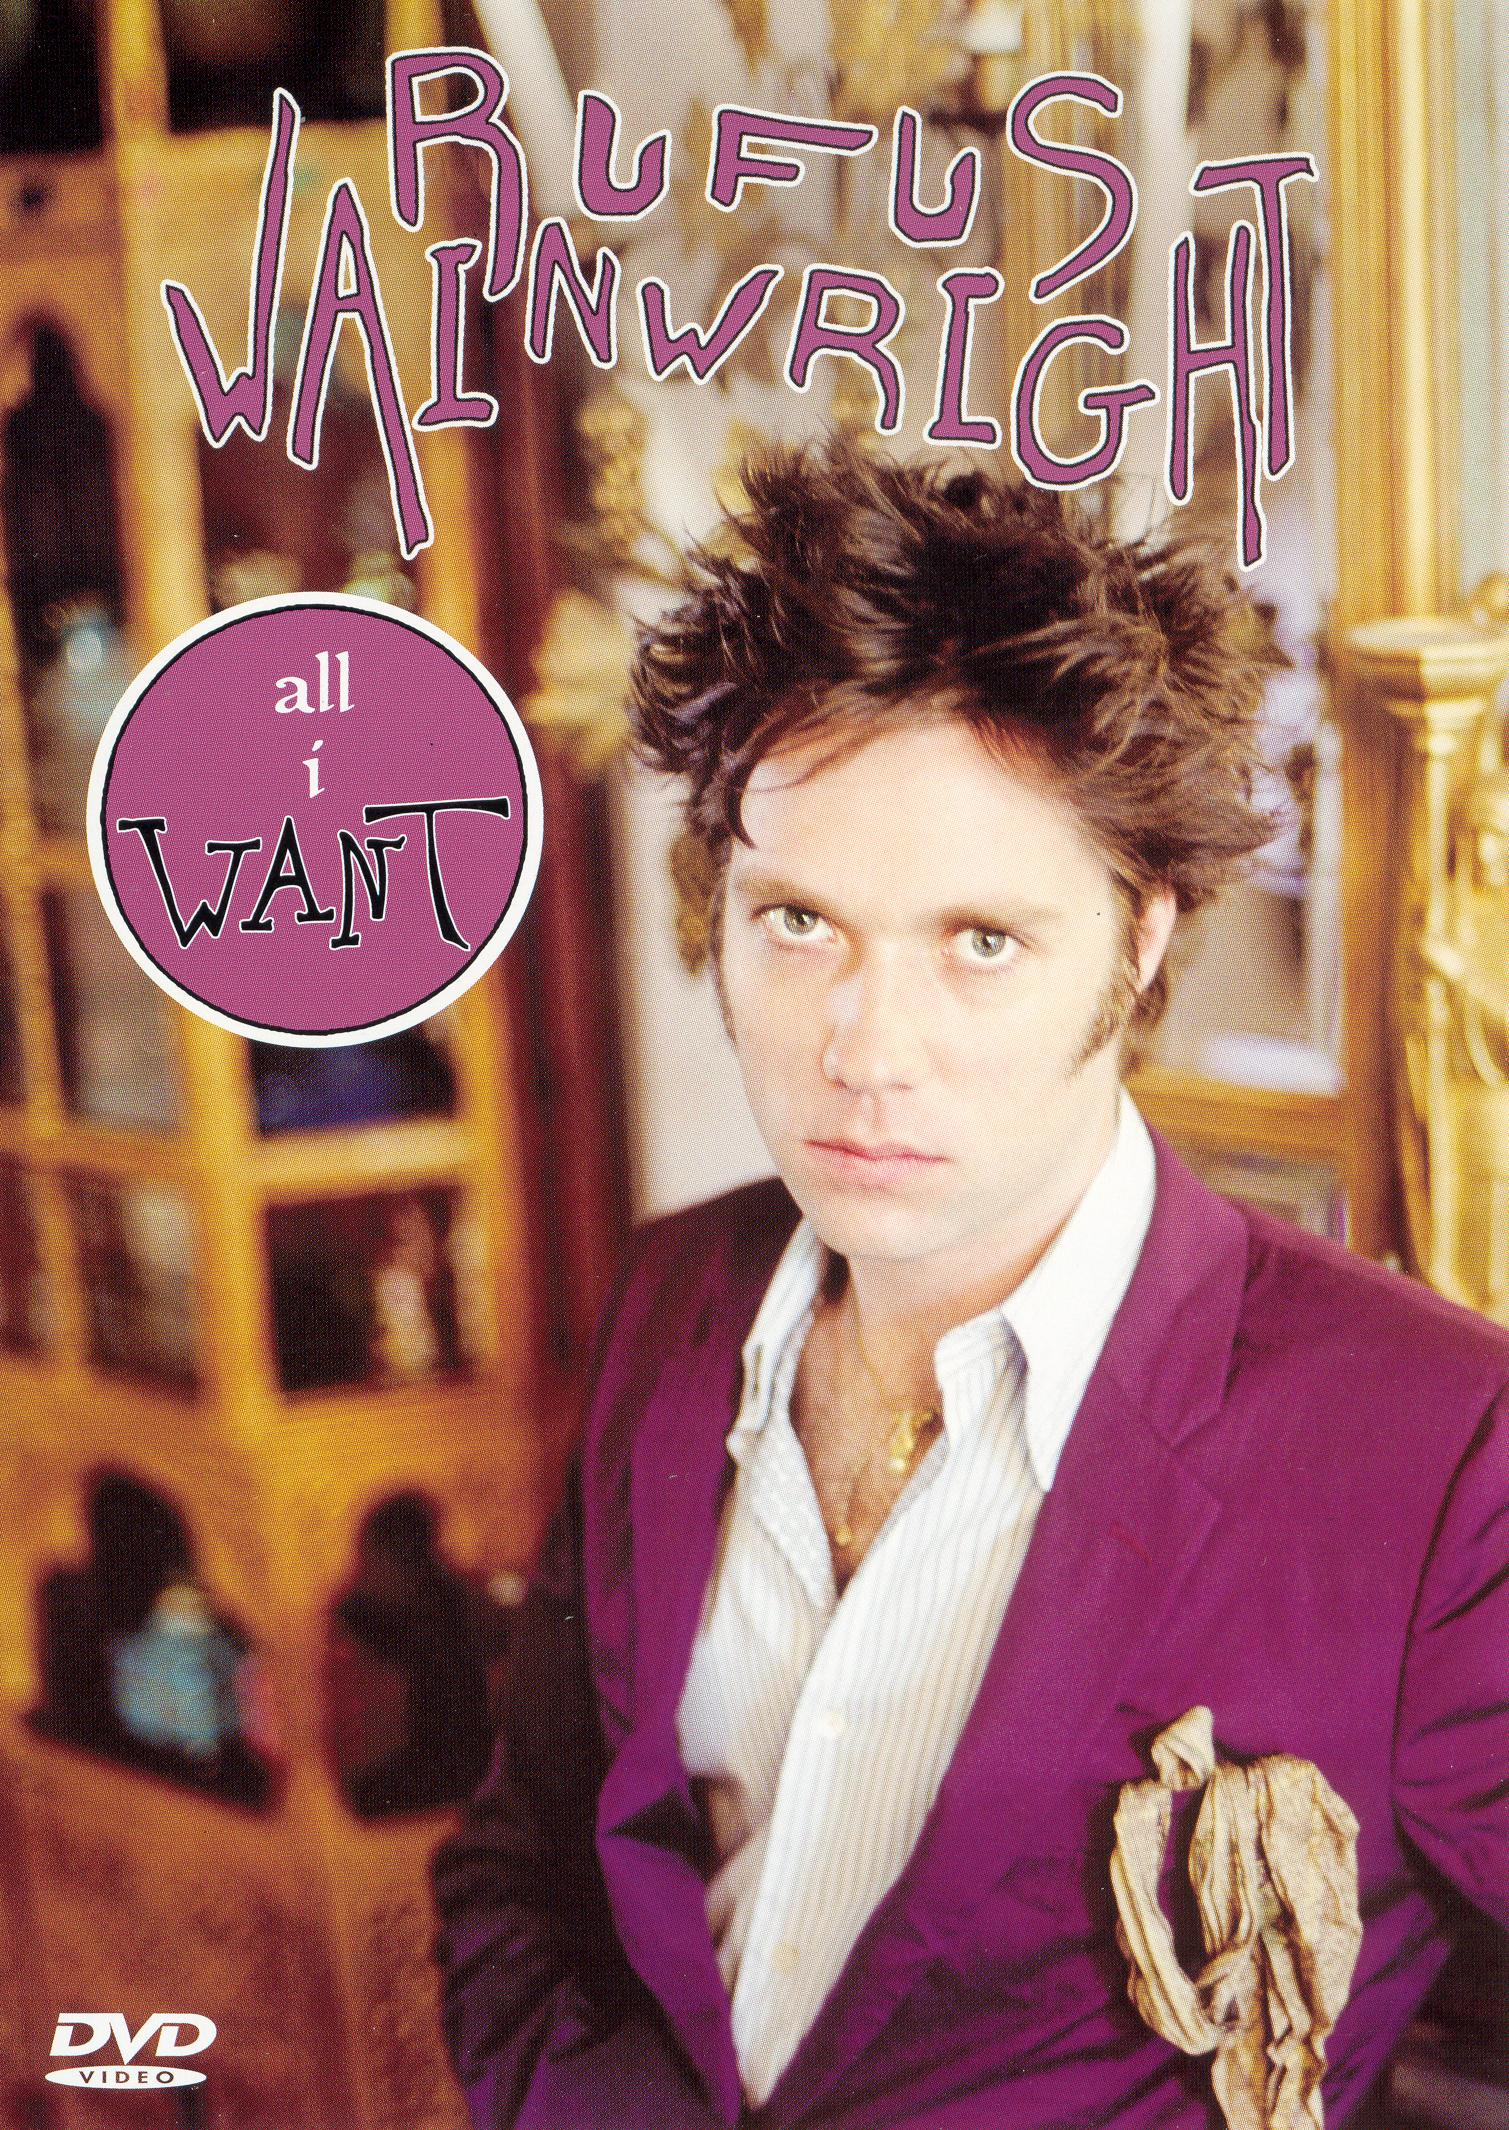 Rufus Wainwright: All I Want